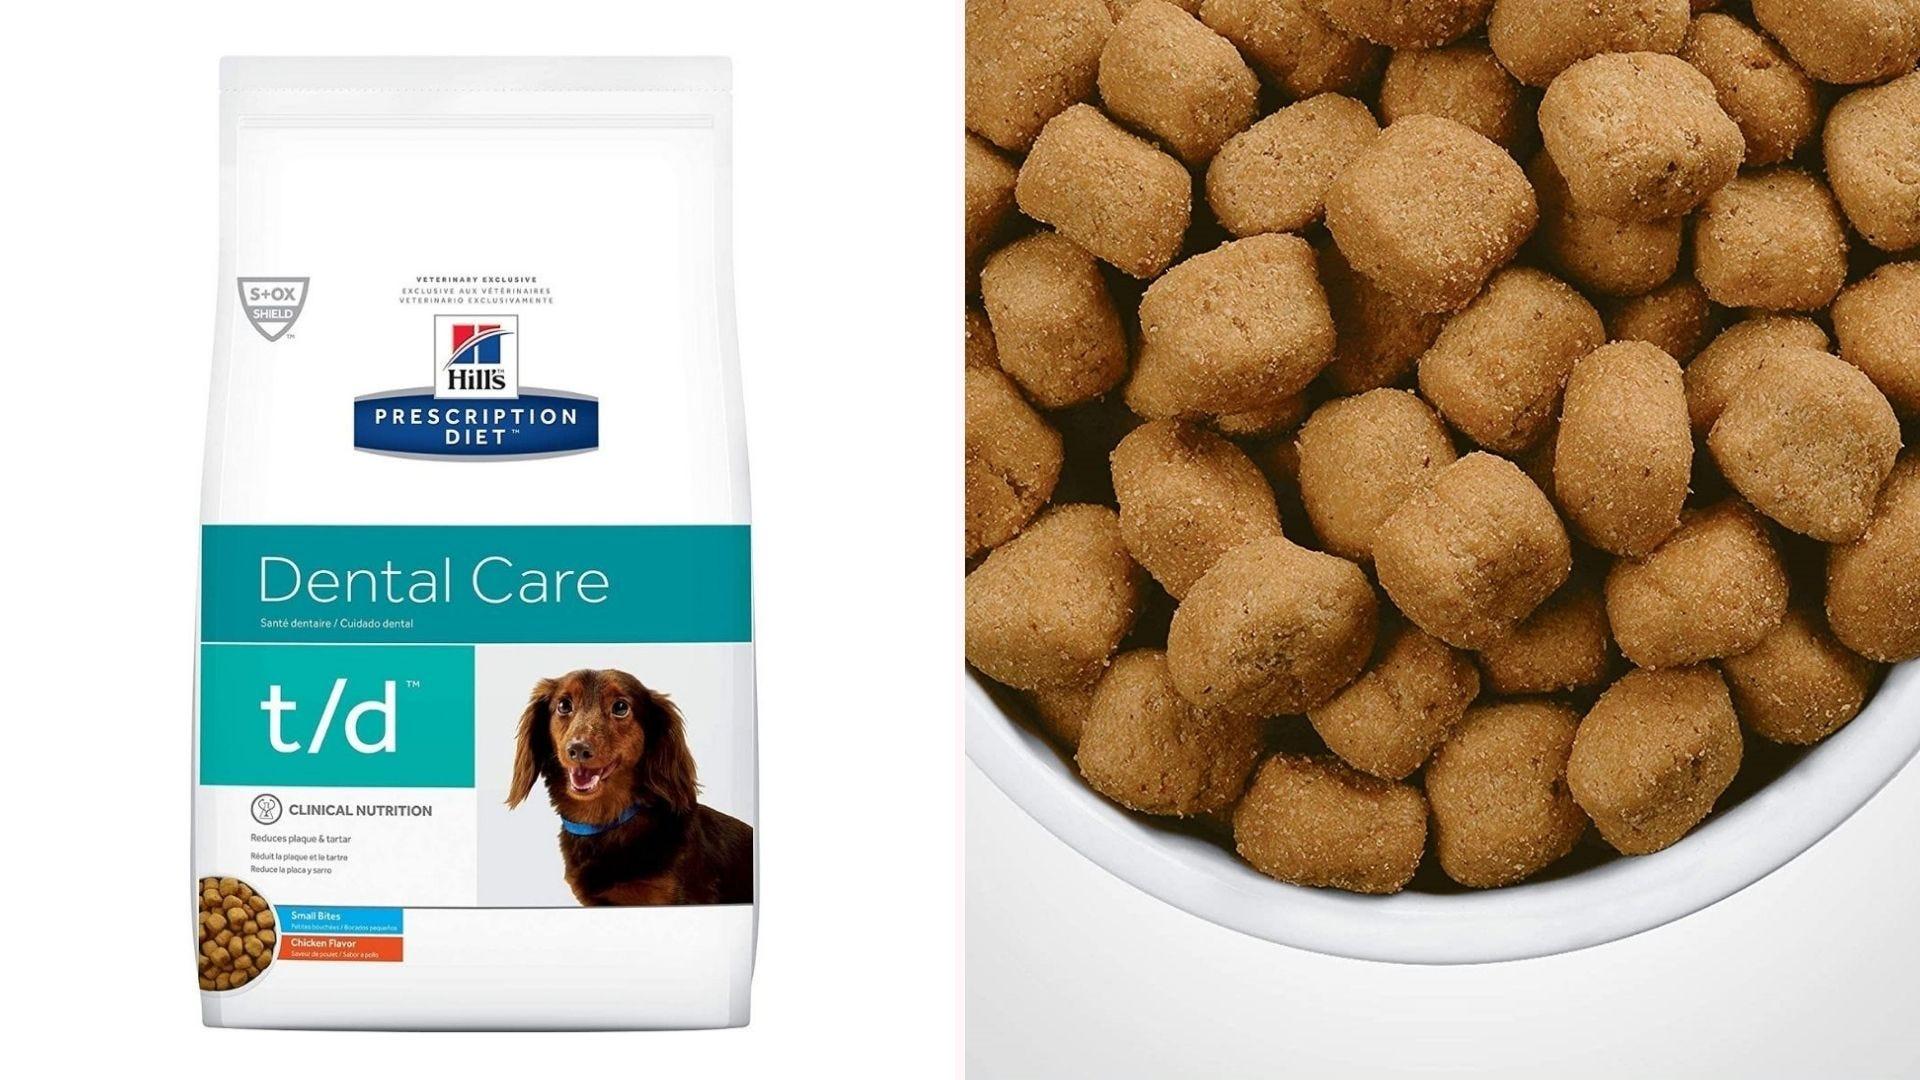 Hill's Prescription Diet dog food.